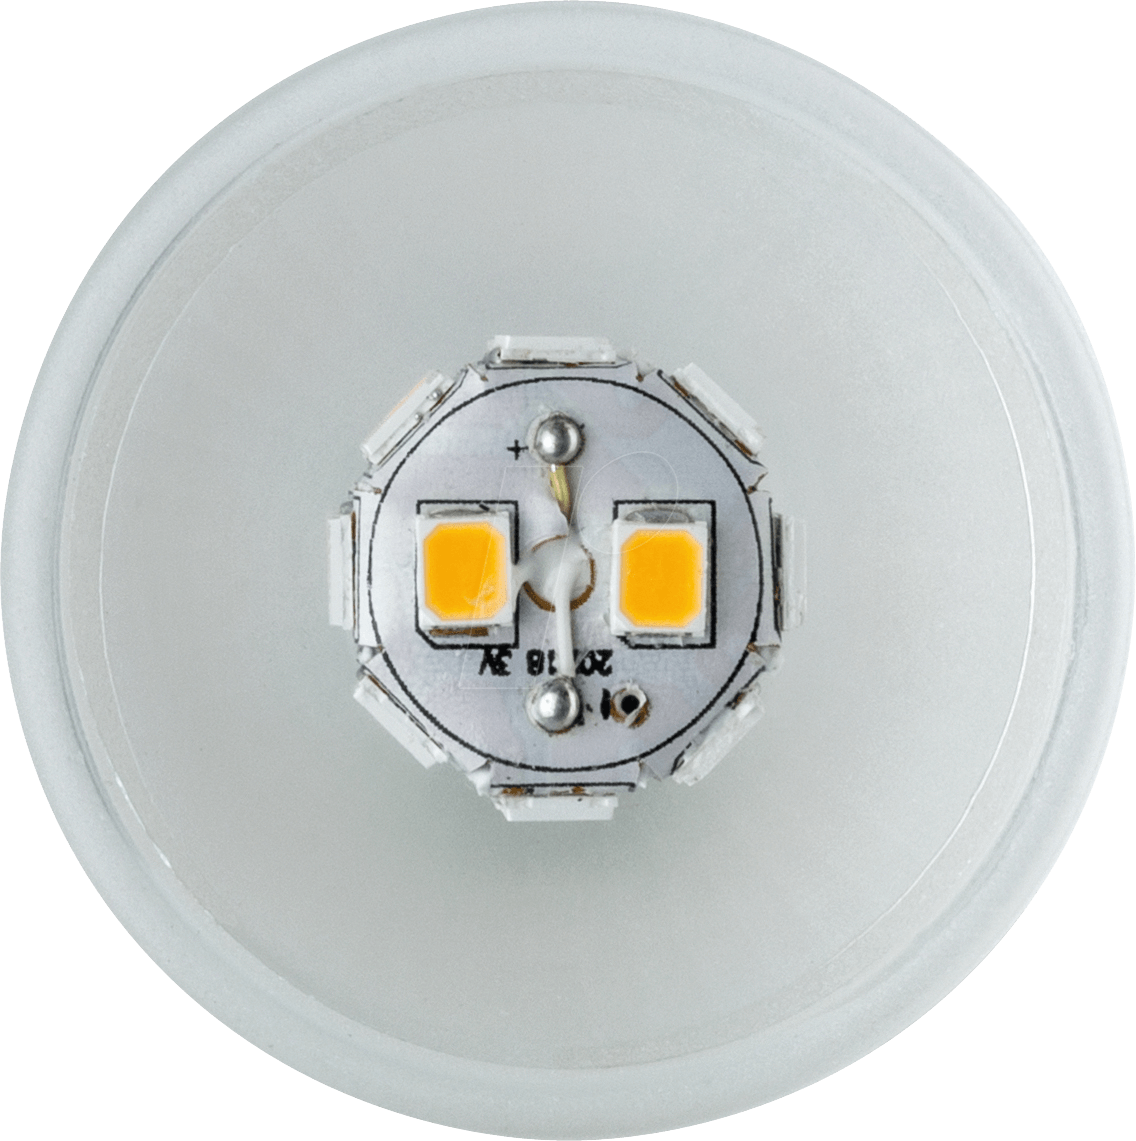 PLM 28329: LED-Lampe, GU4, 1,8 W, 100 lm, 2700 K bei reichelt elektronik